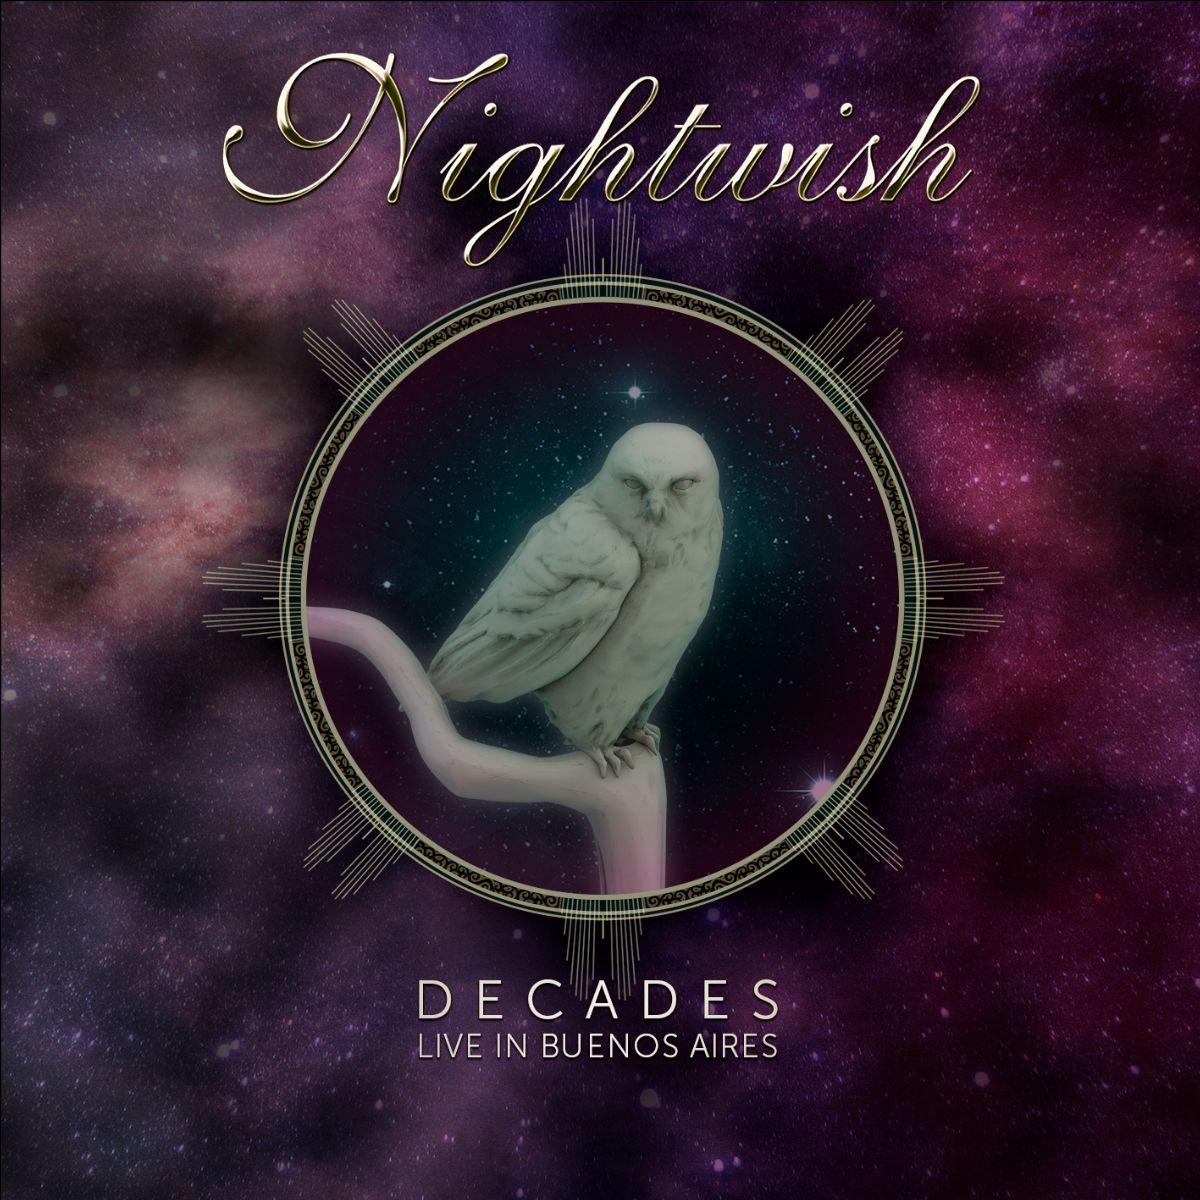 decades live in buenos aires nightwish